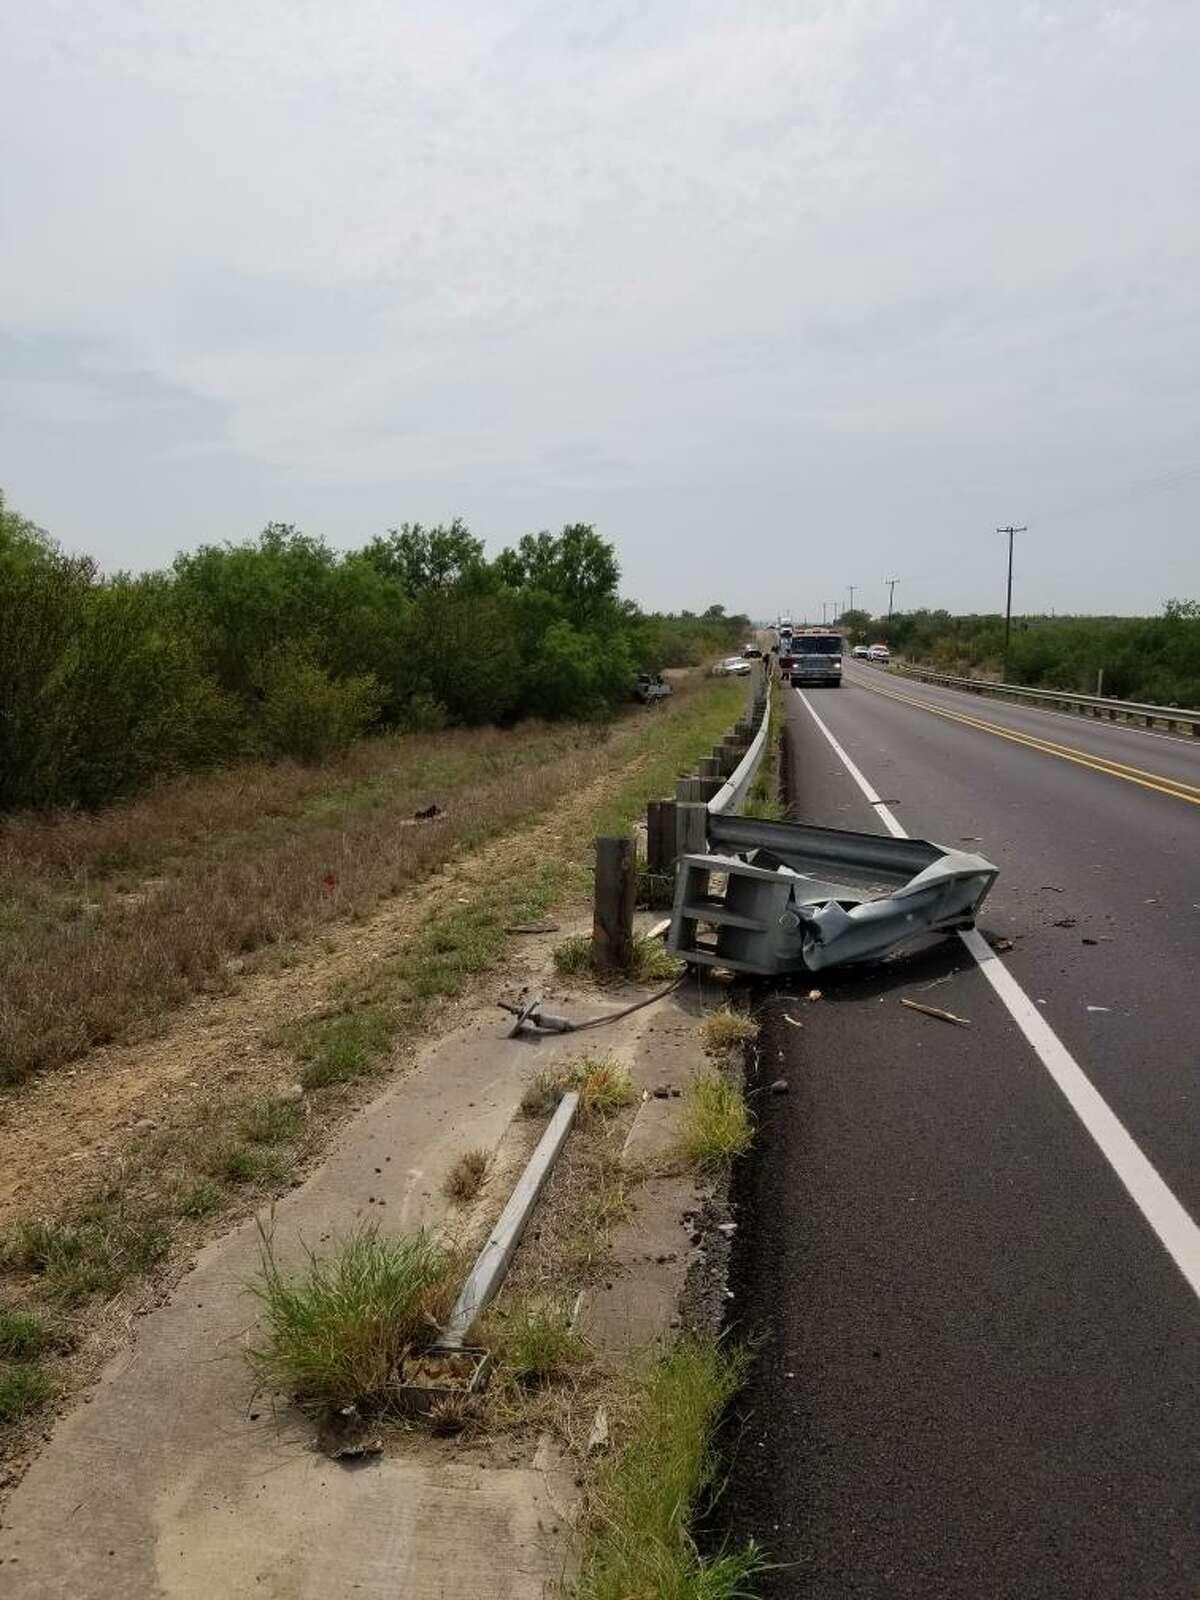 A man was taken to Laredo Medical Center in serious condition following a crash in south Laredo.